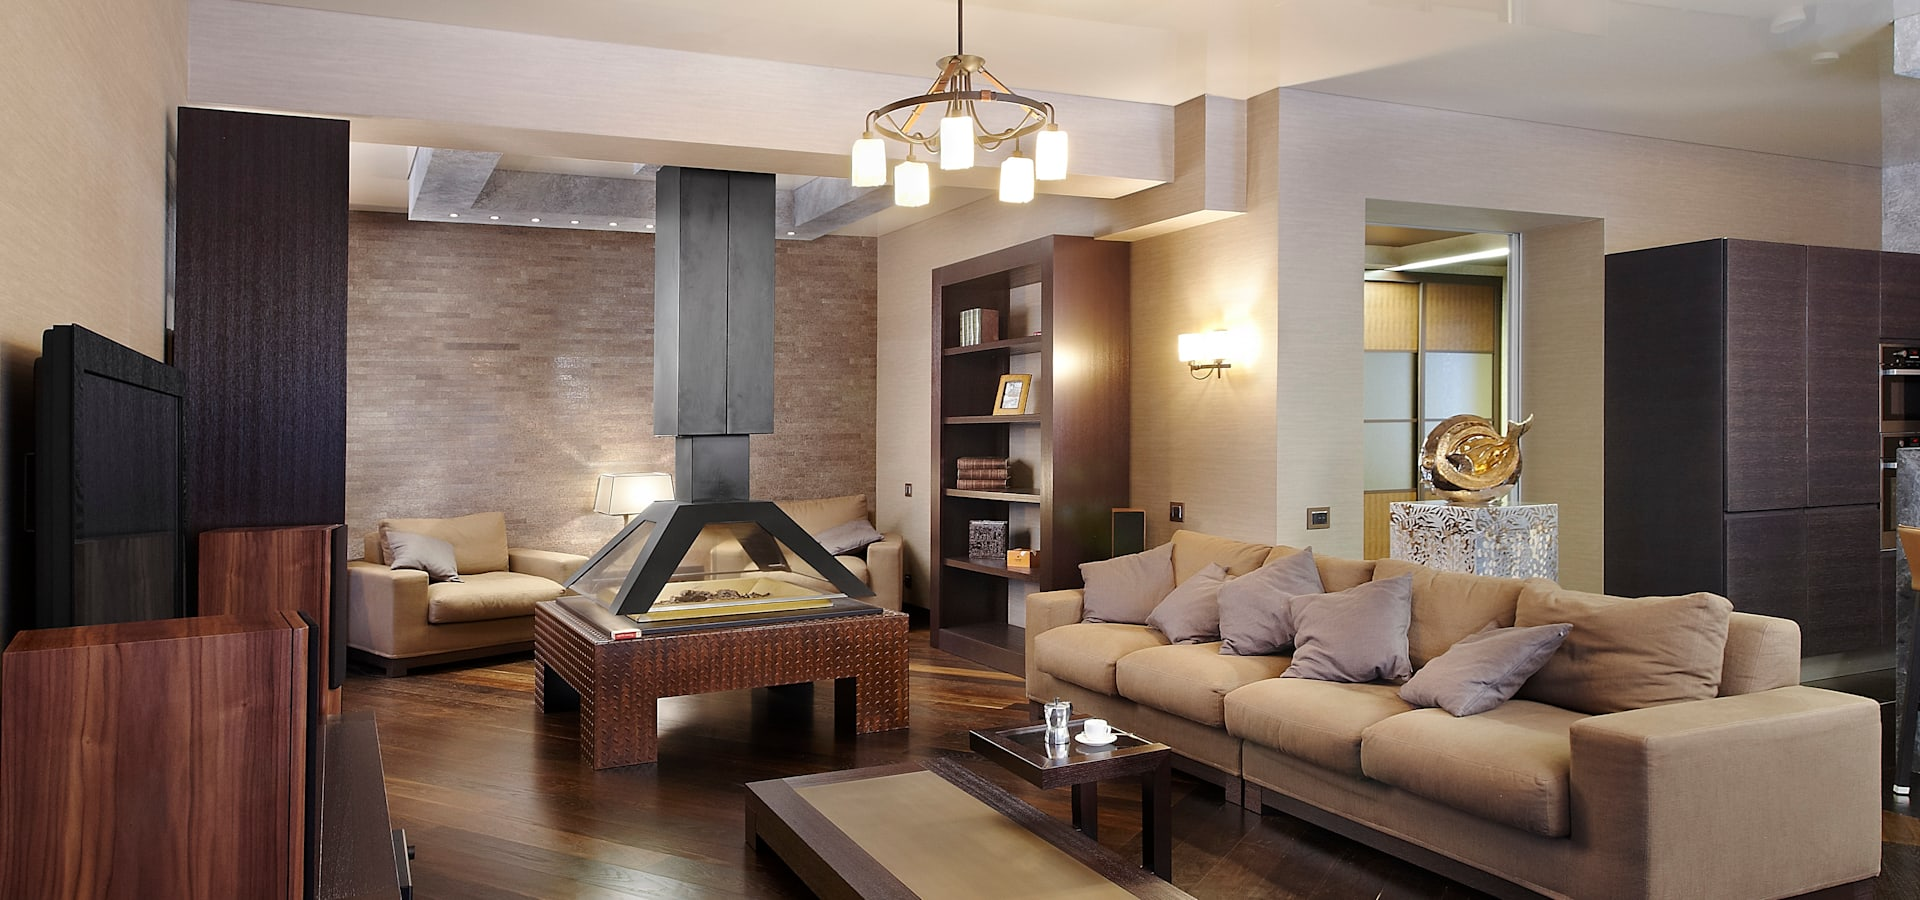 Baydyuk Design Company